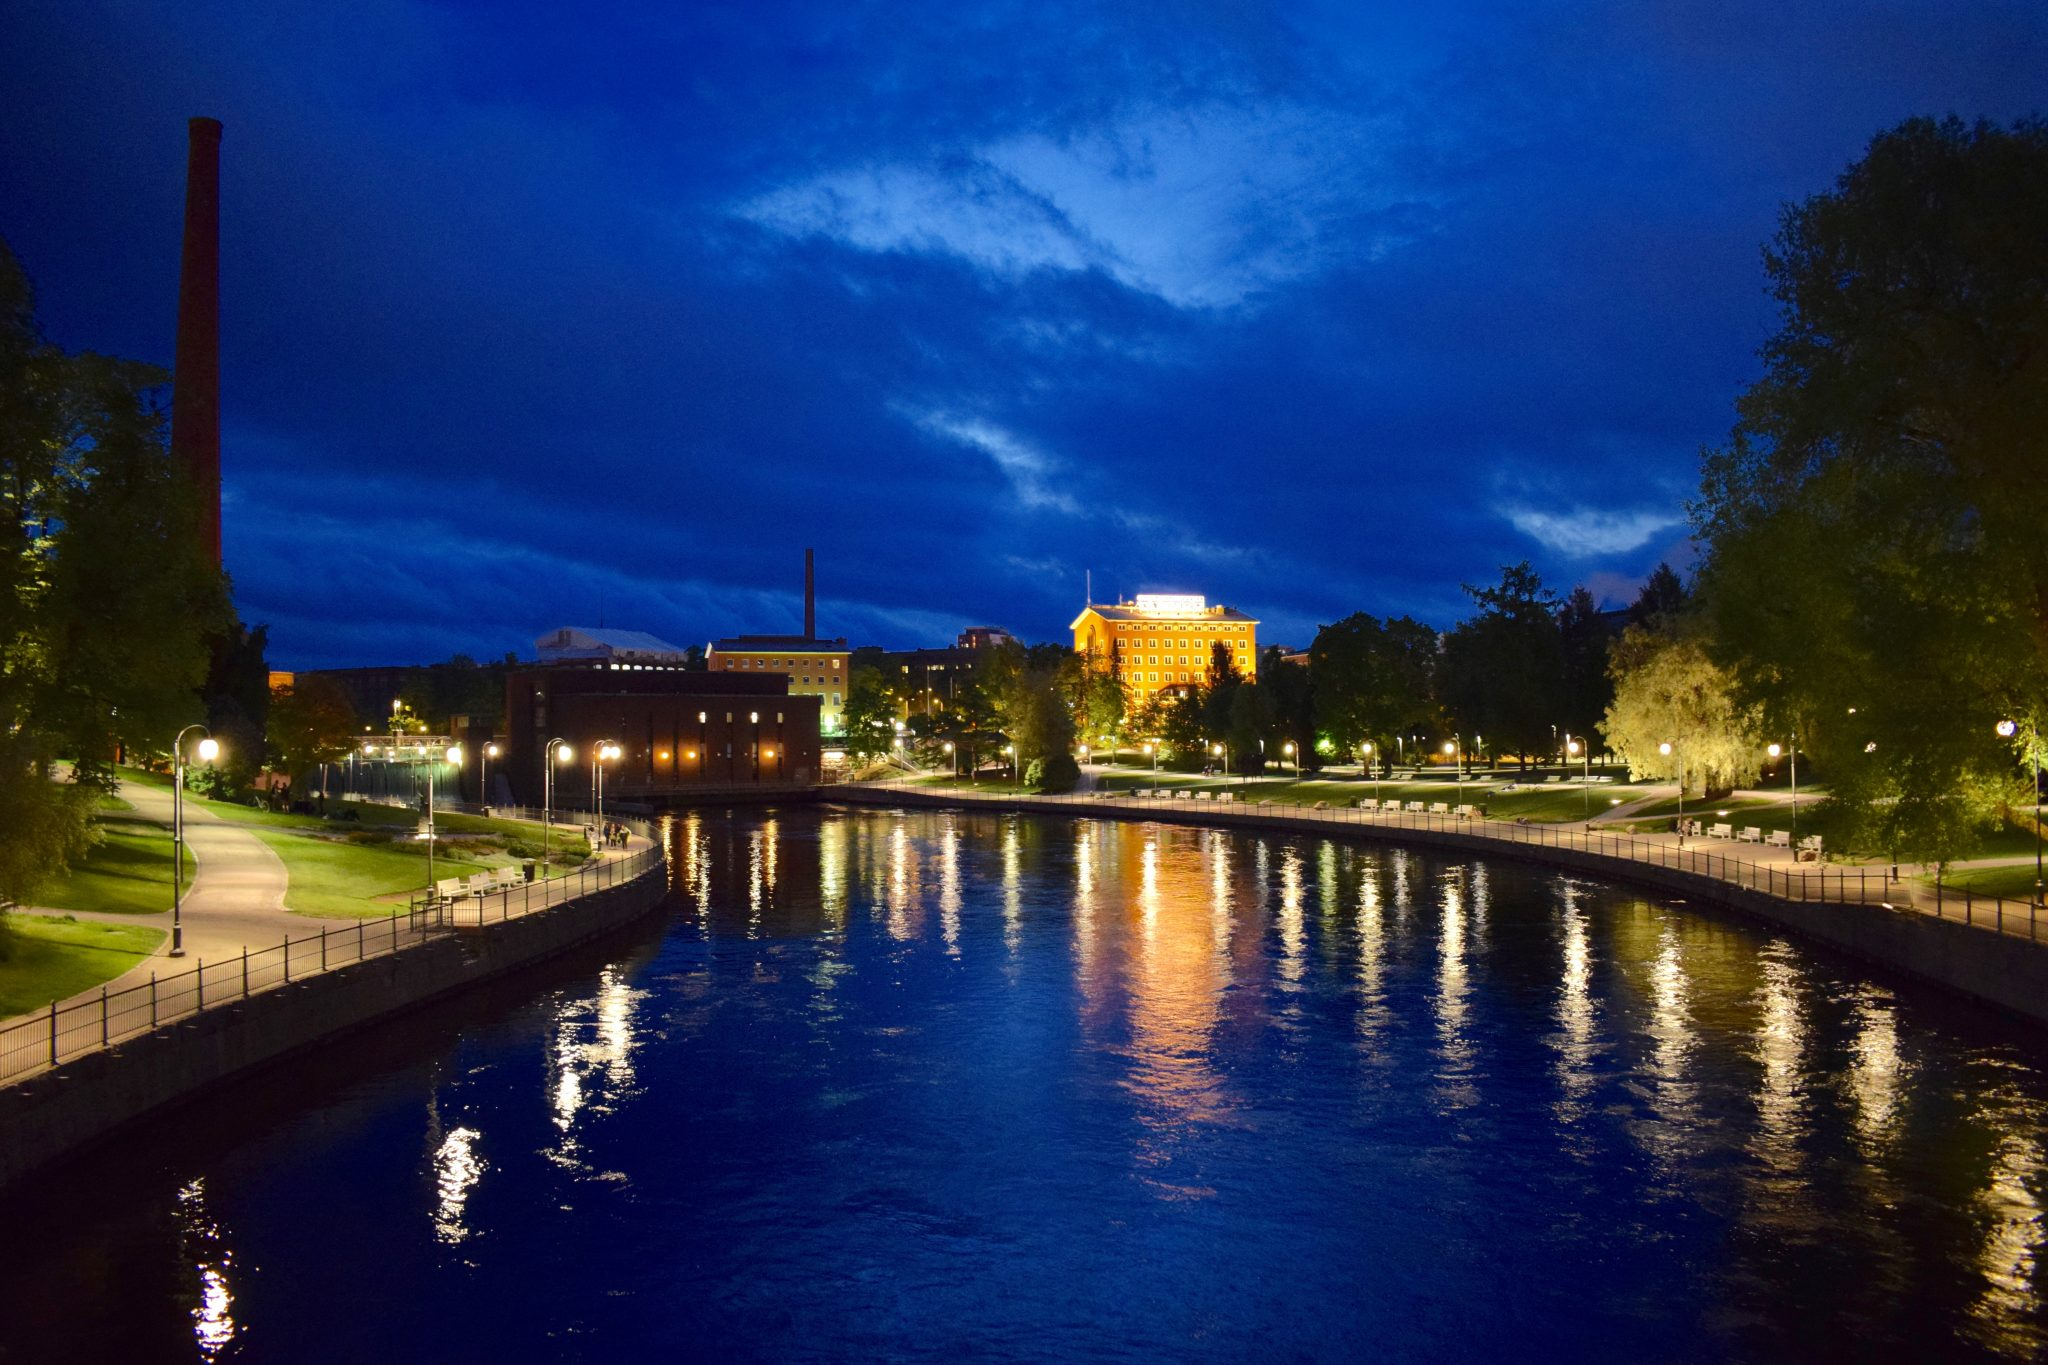 Tampere Night